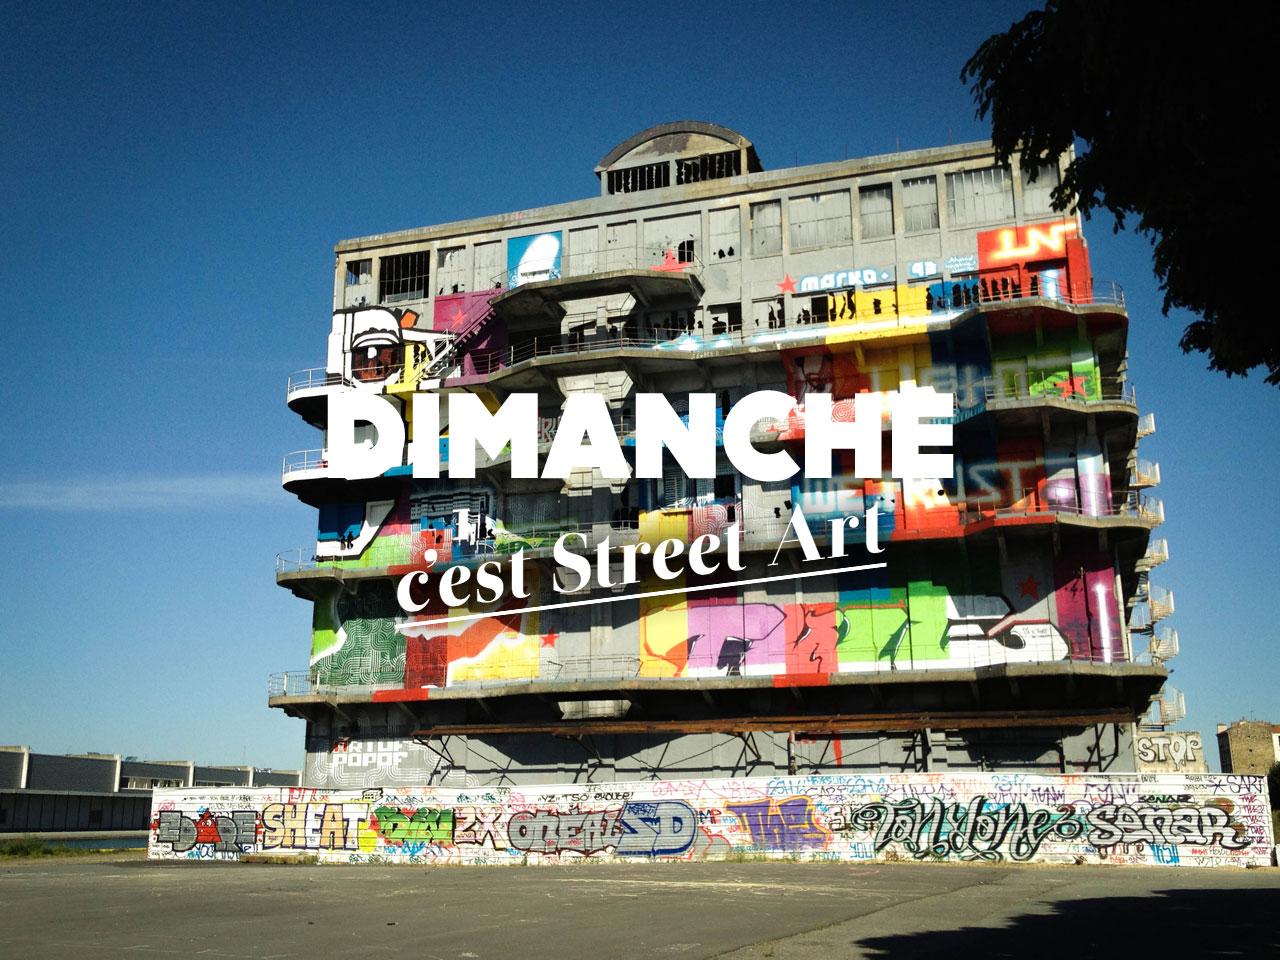 https://i2.wp.com/erreur14.com/wp-content/uploads/2012/09/dimanche_street.jpg